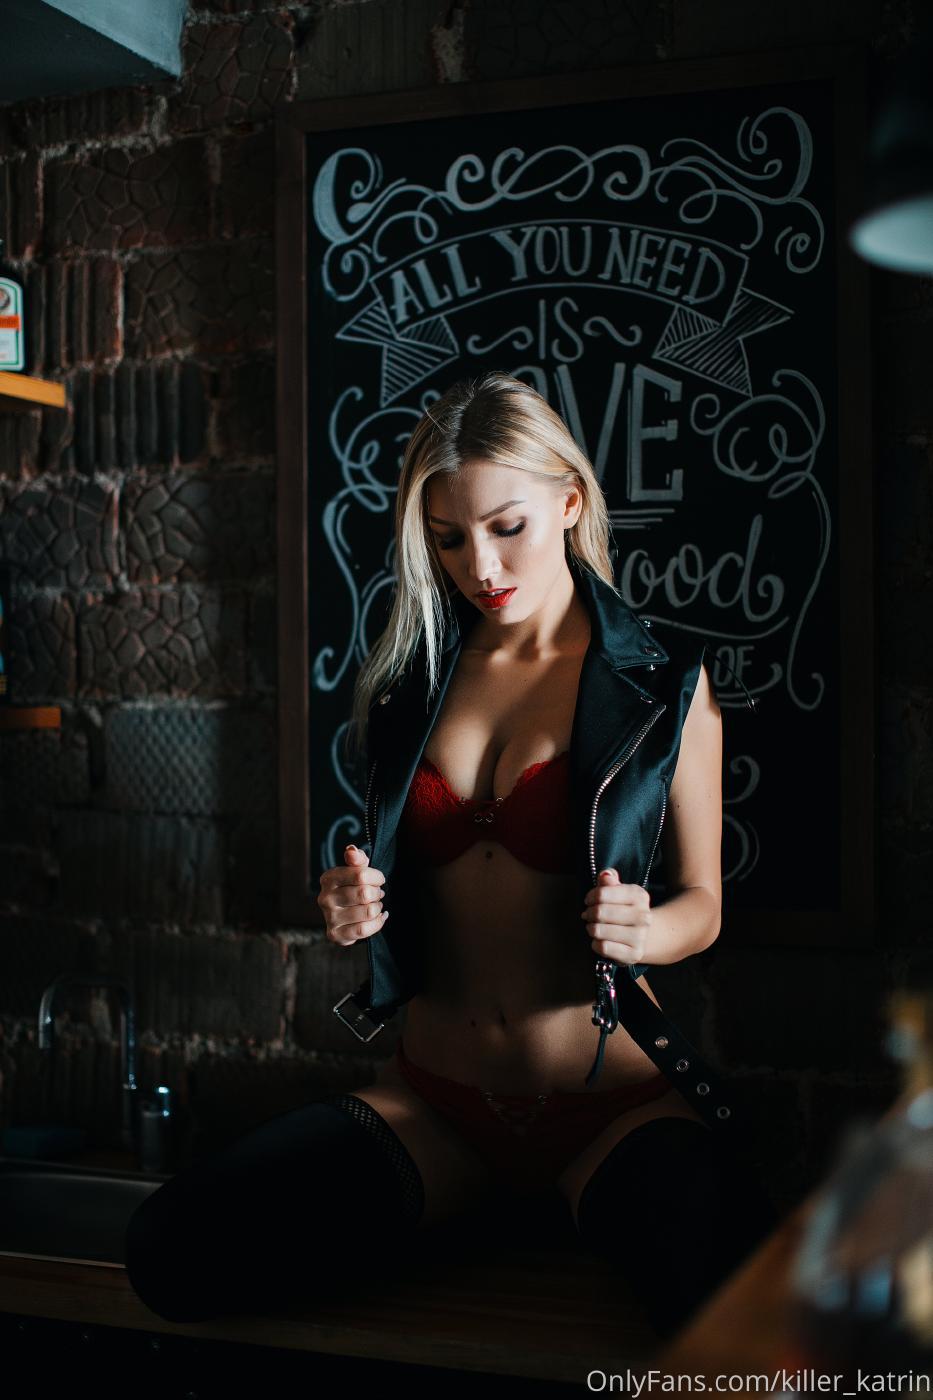 Killer Katrin Bar Striptease Onlyfans Set Leaked 0007